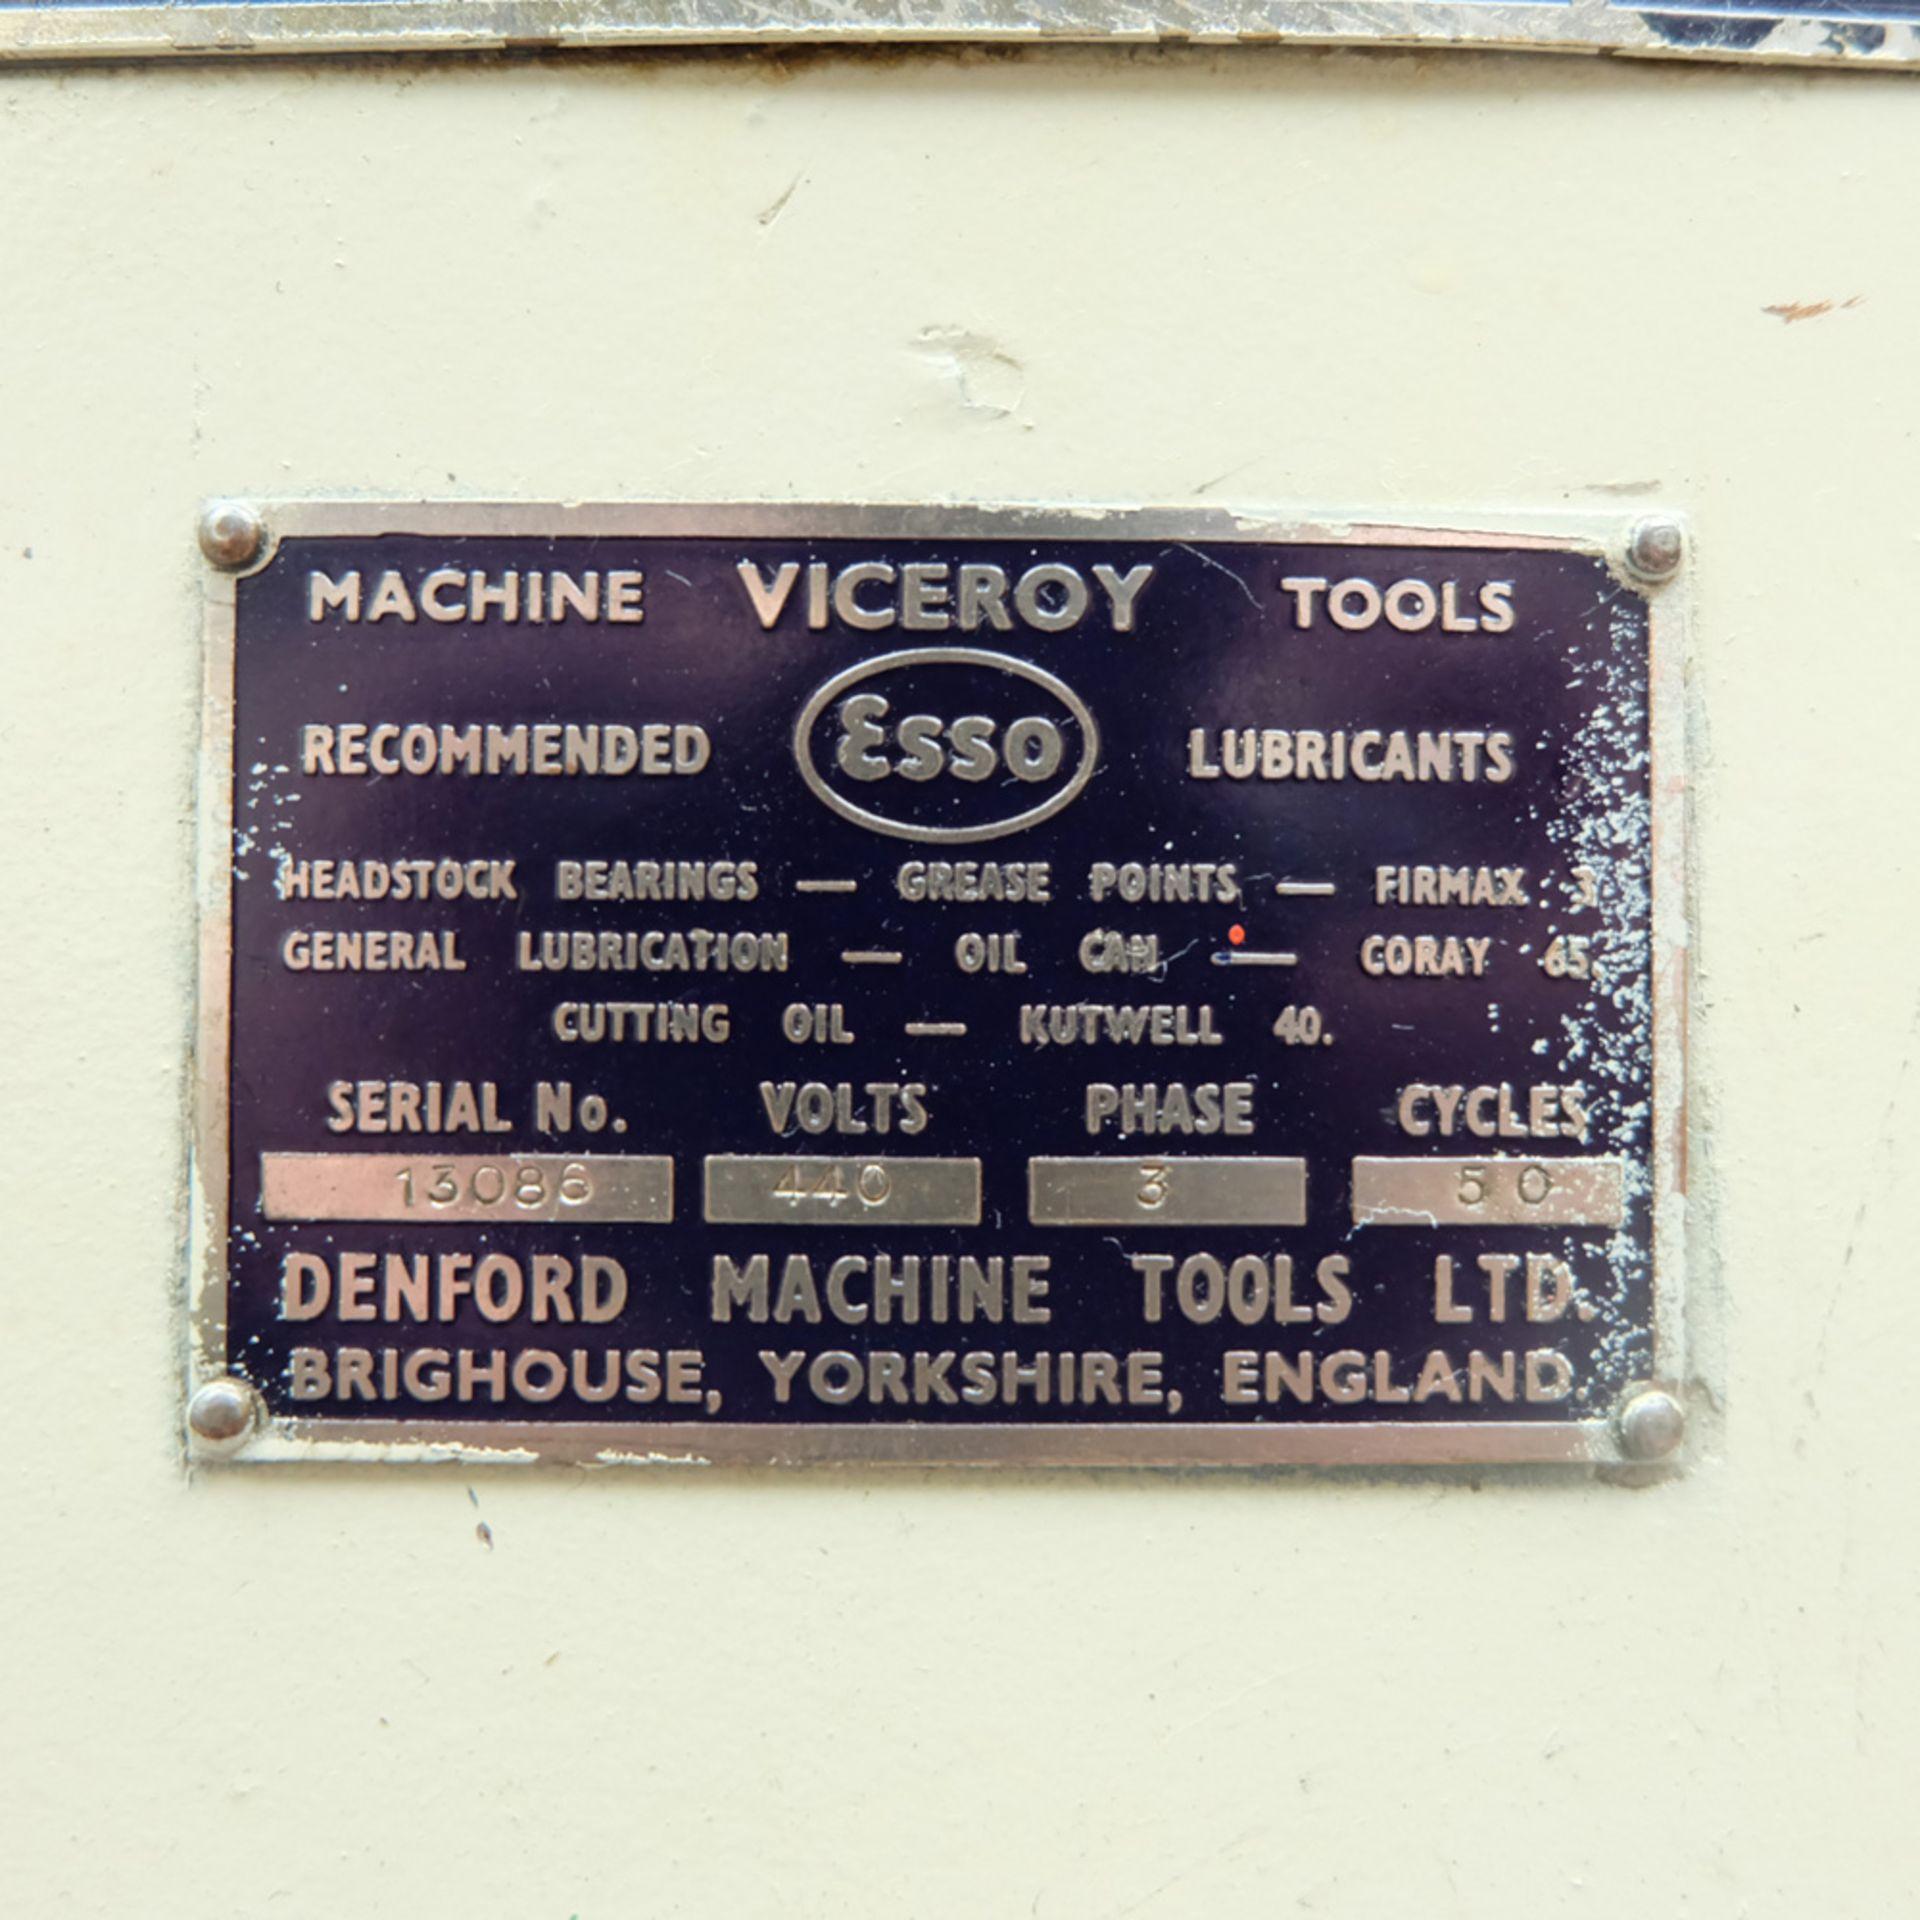 Viceroy Model TDS9 Double Ended Pedestal Polishing Machine. - Image 6 of 6